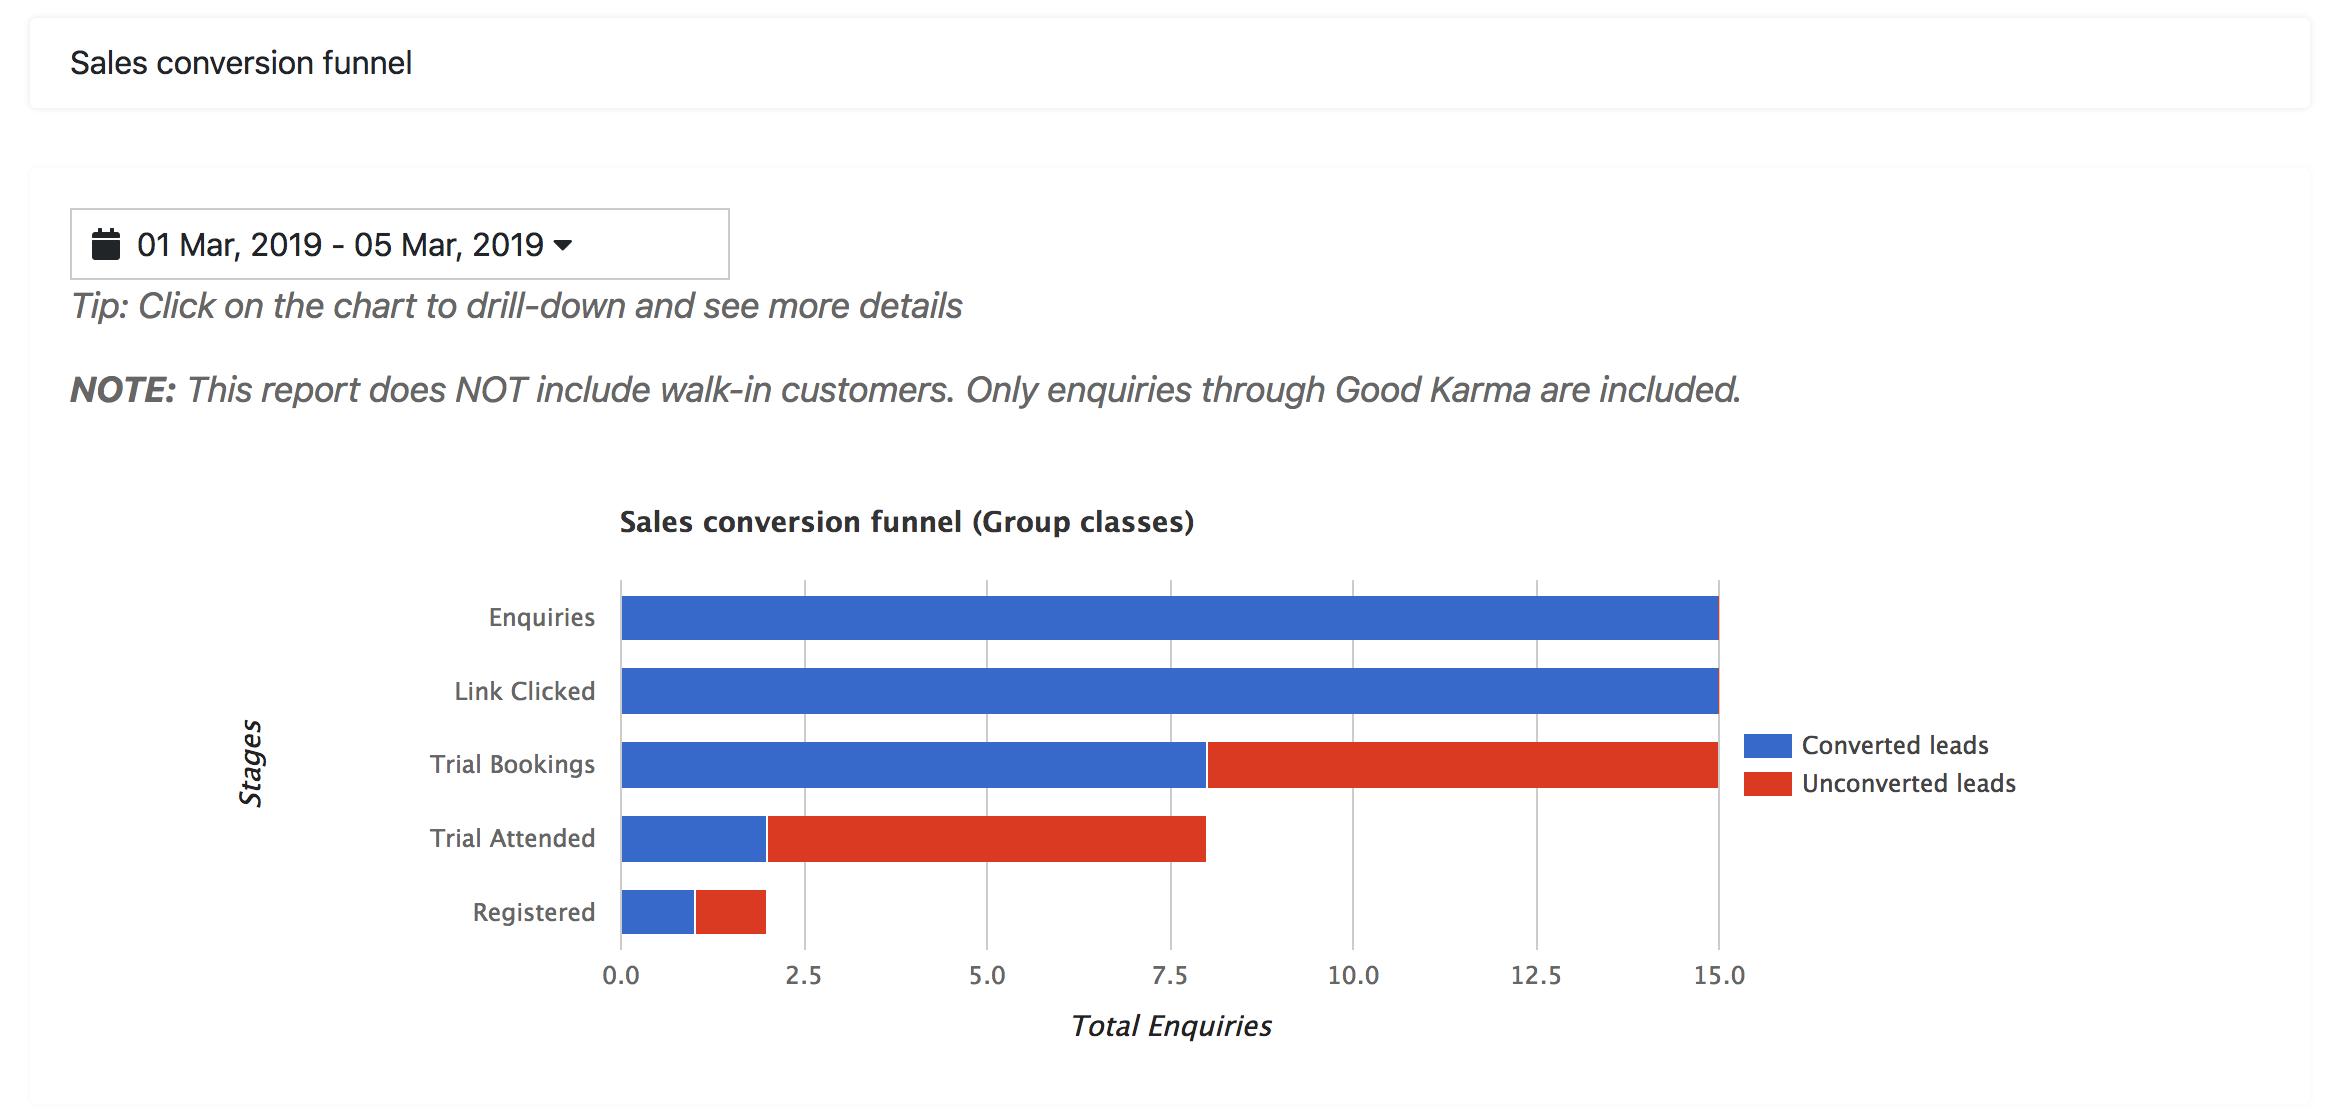 Sales_conversion_funnel___Chaitanya_Wellnes___.png